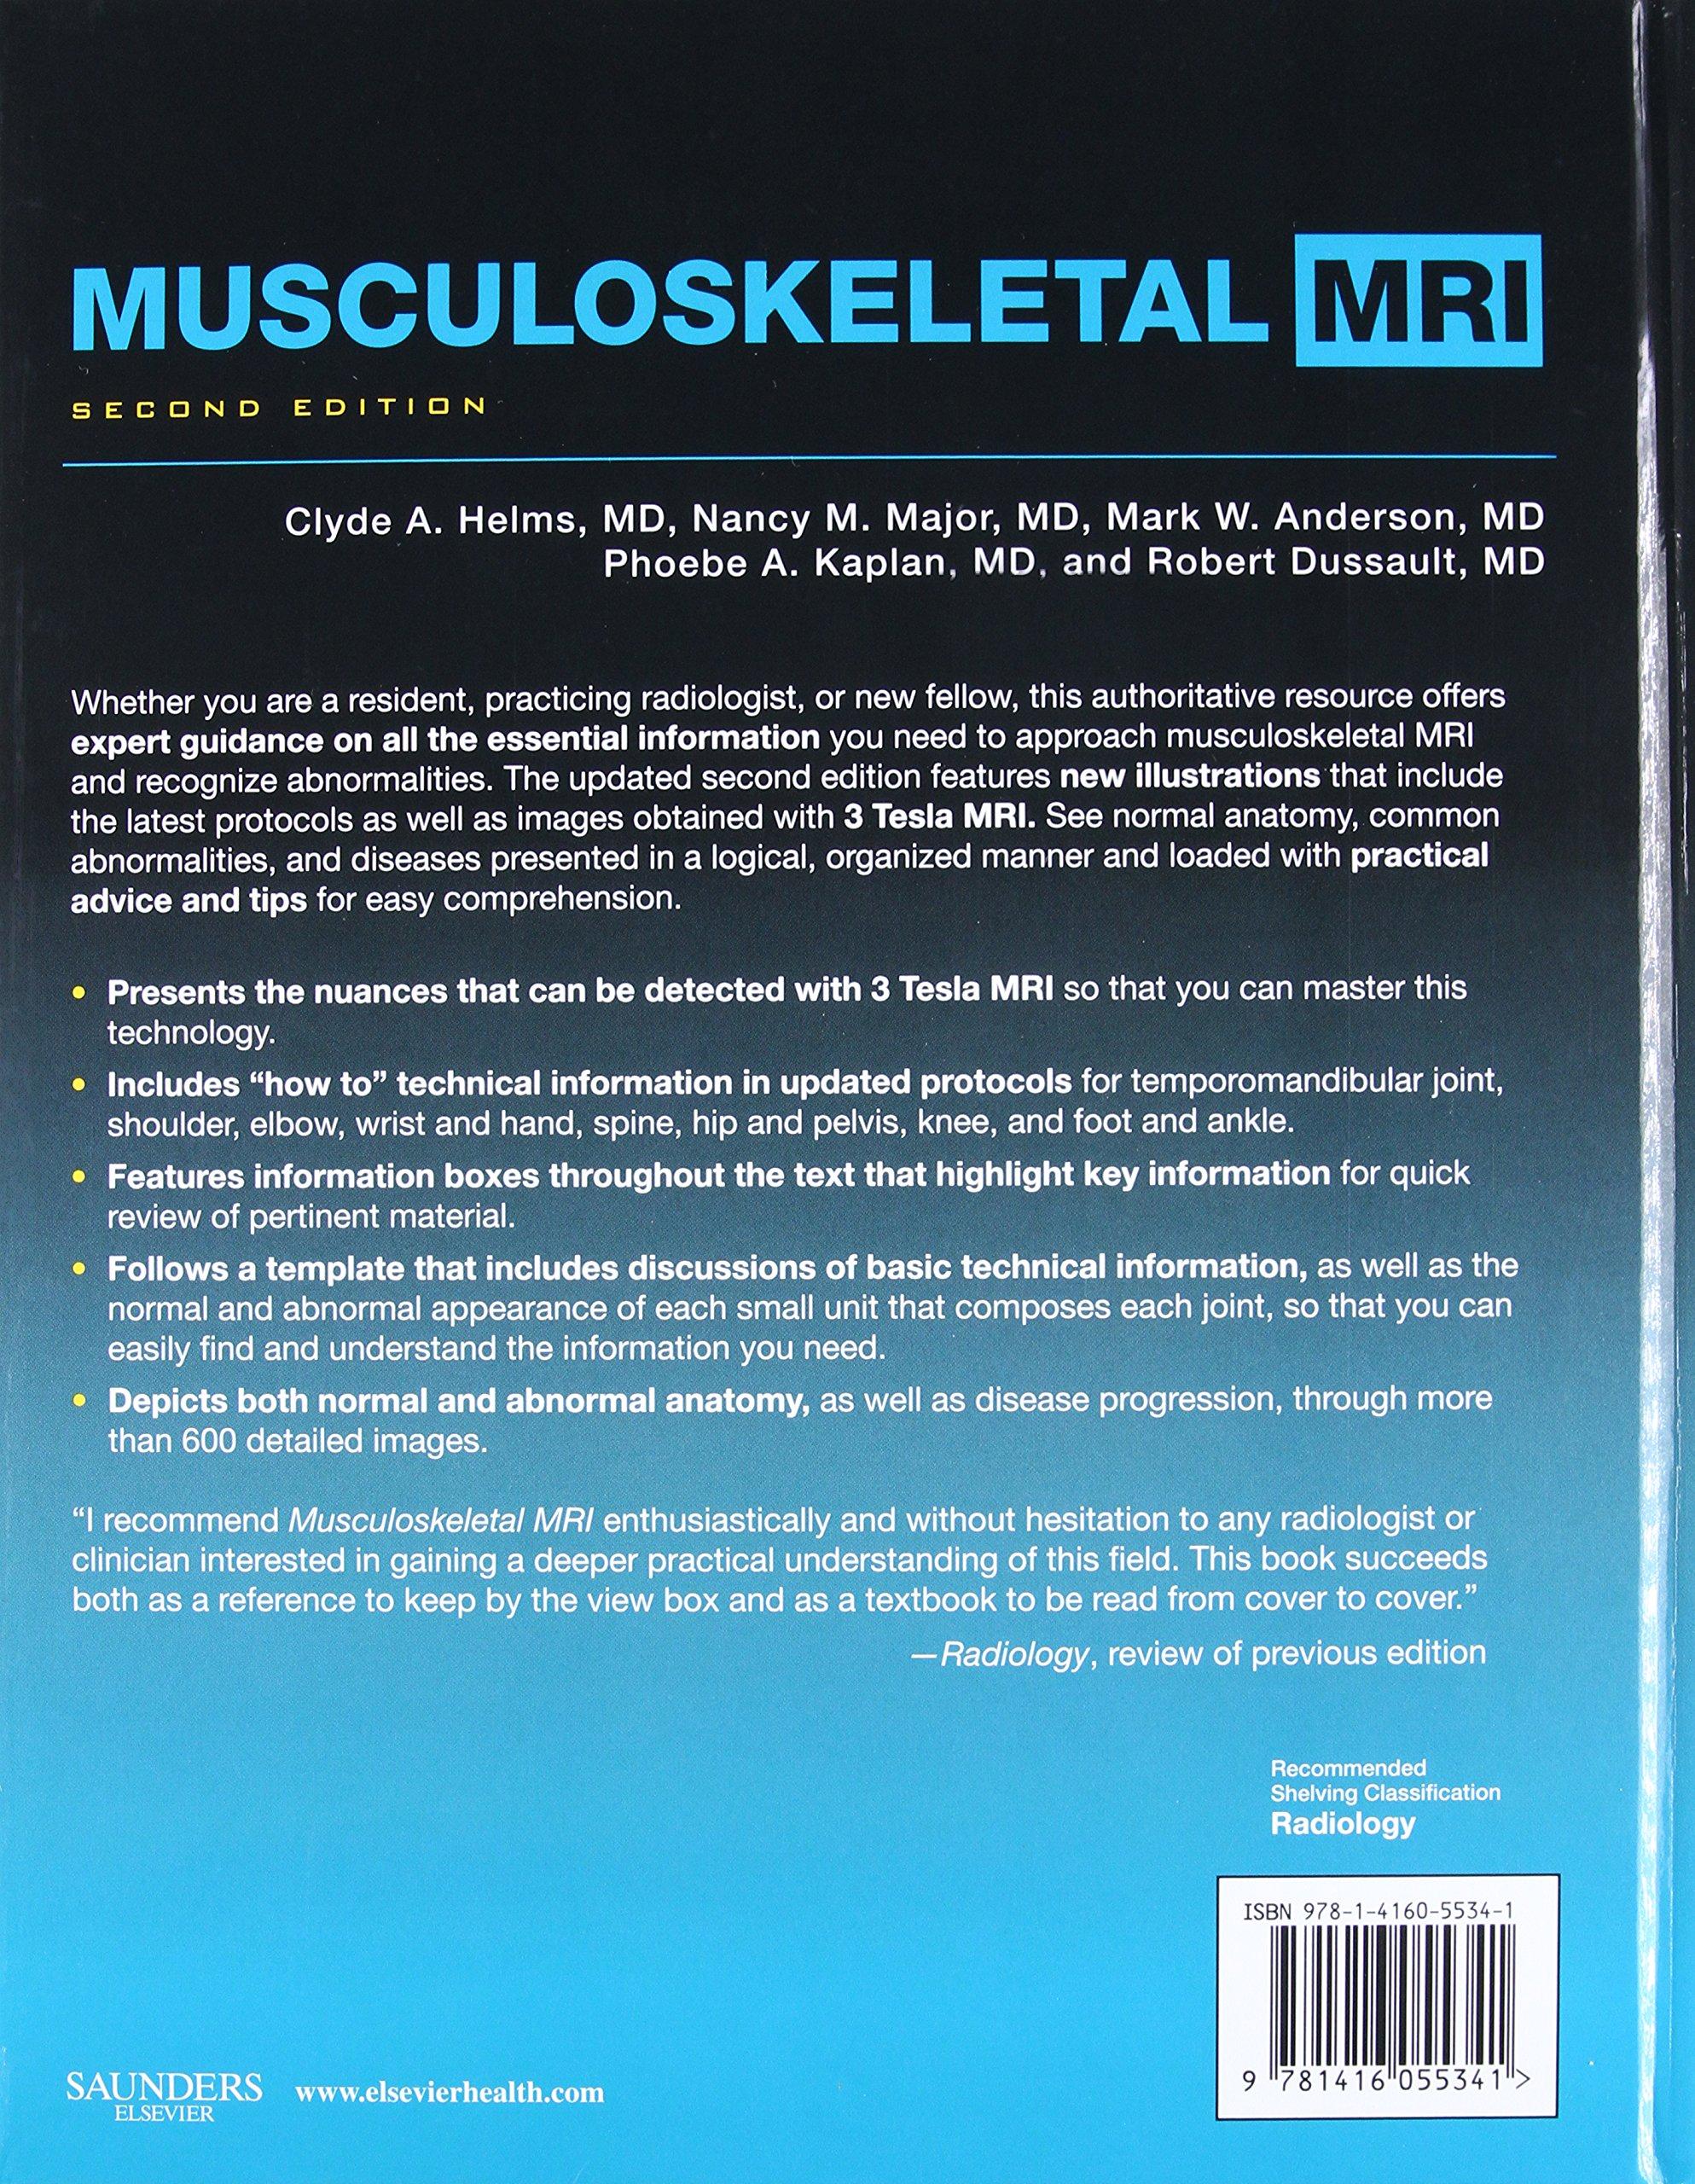 MUSCULOSKELETAL MRI HELMS PDF DOWNLOAD